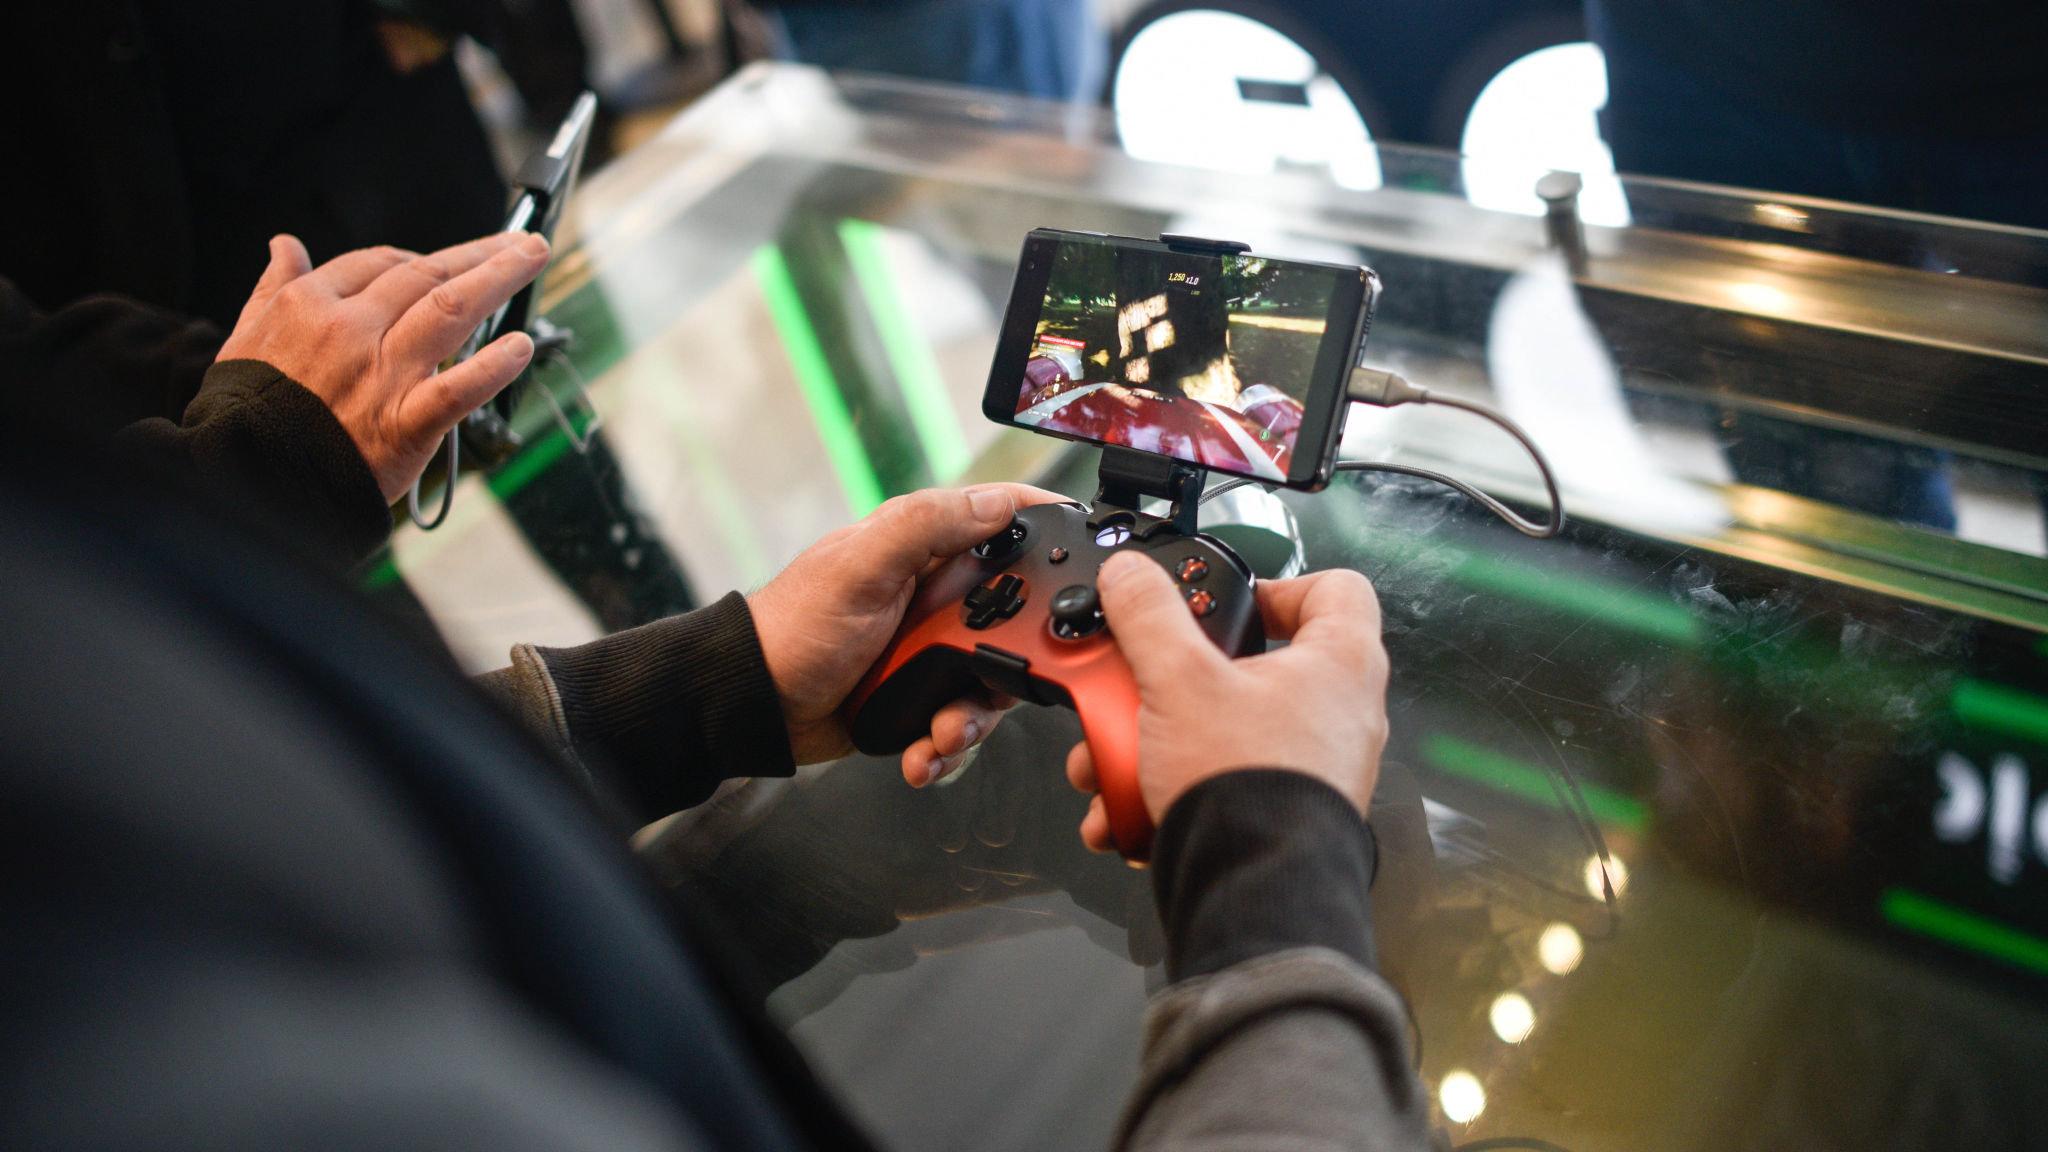 Google's Stadia takes aim at $130bn video game market